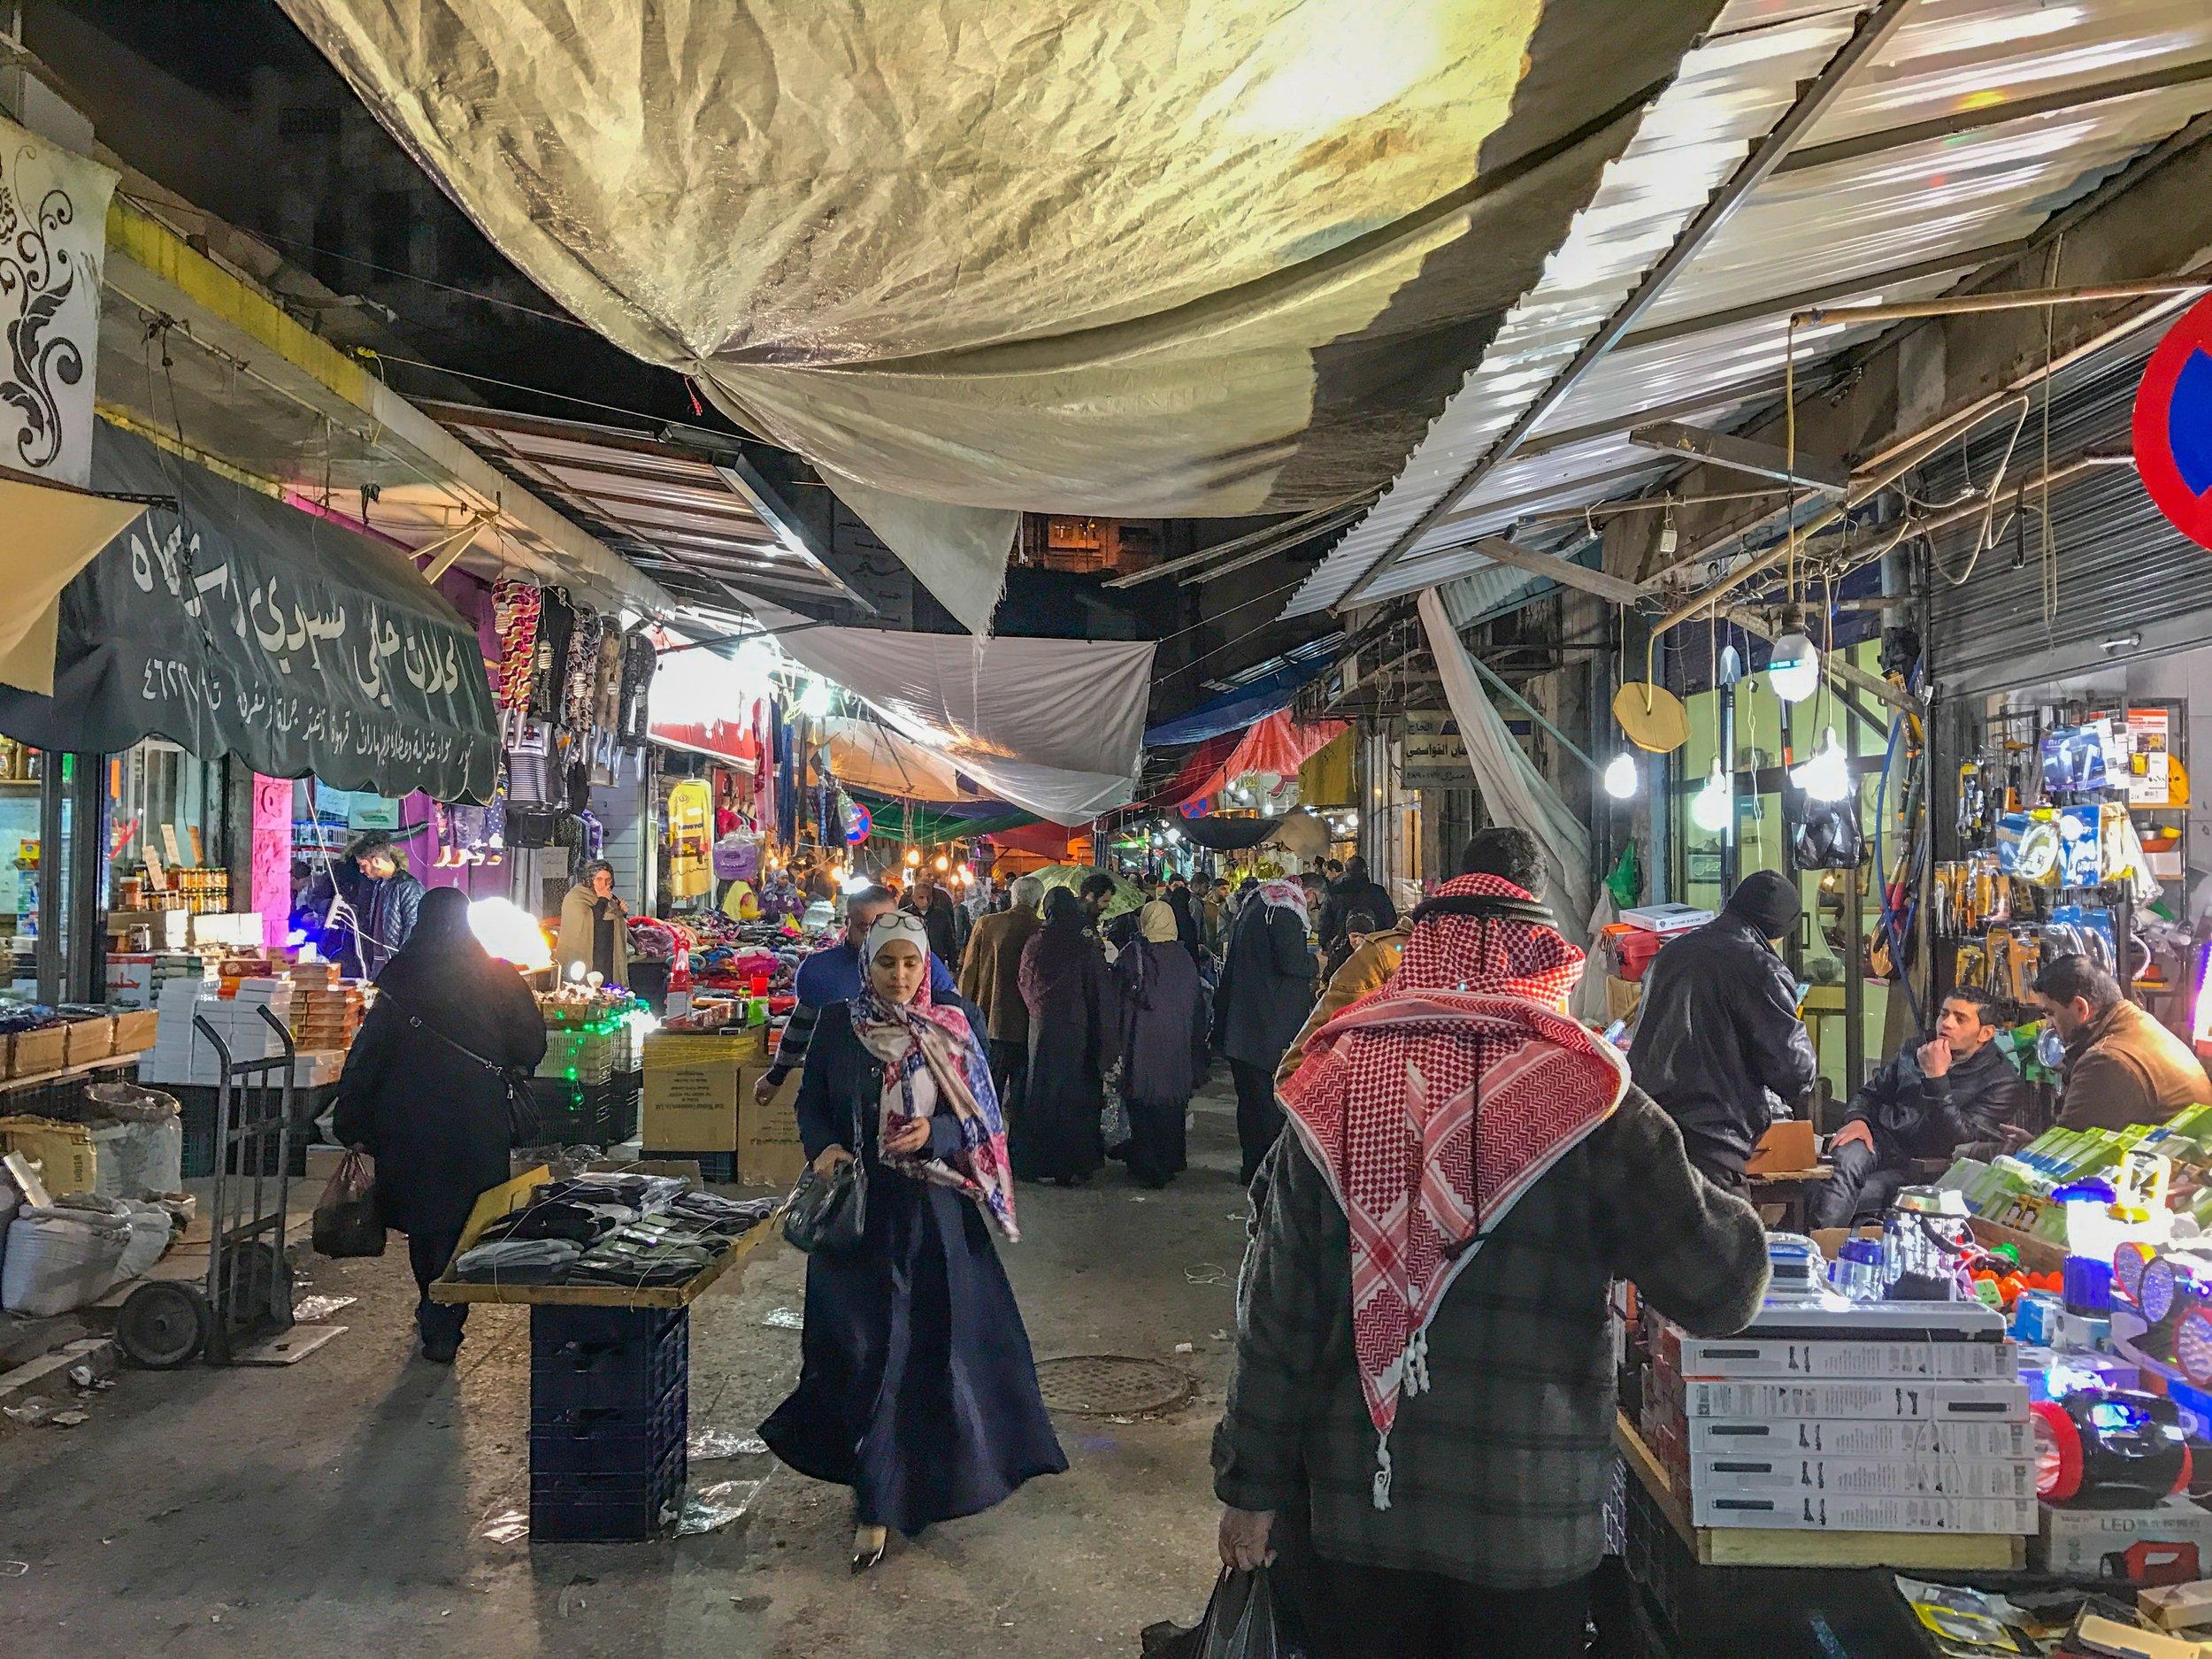 Night market in Amman